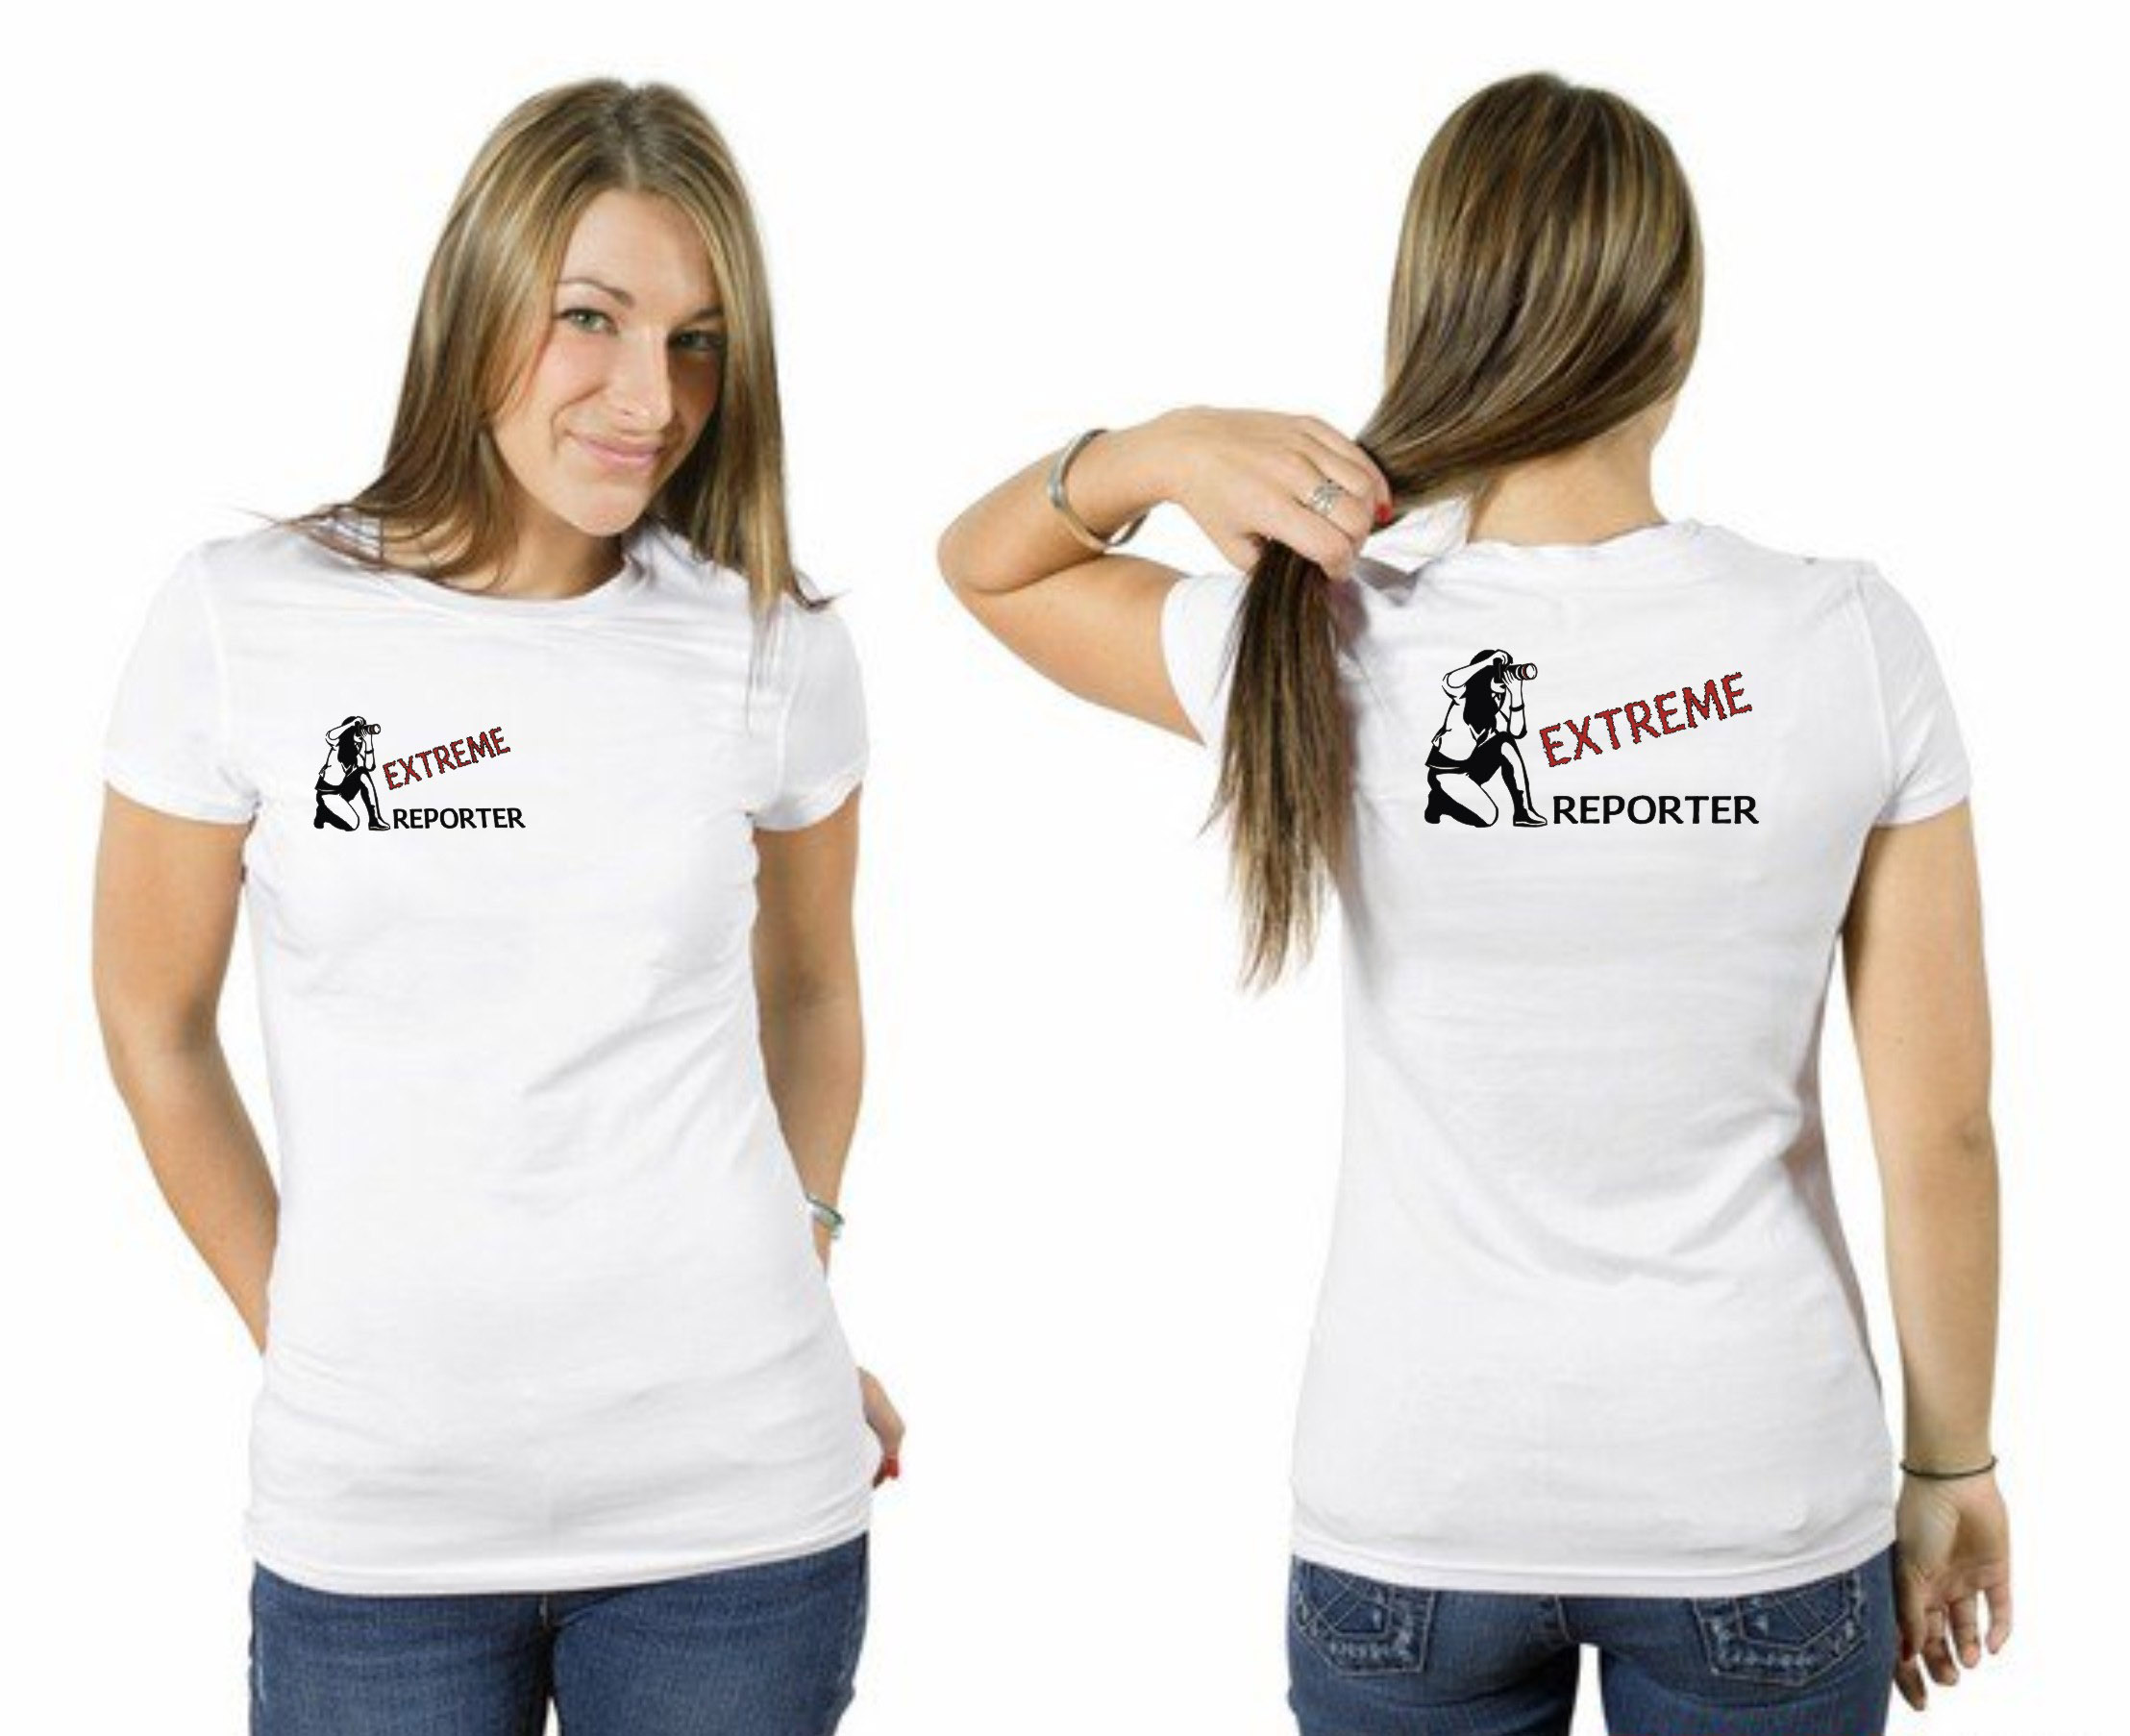 Логотип для экстрим фотографа.  фото f_5665a53e7875377f.jpg